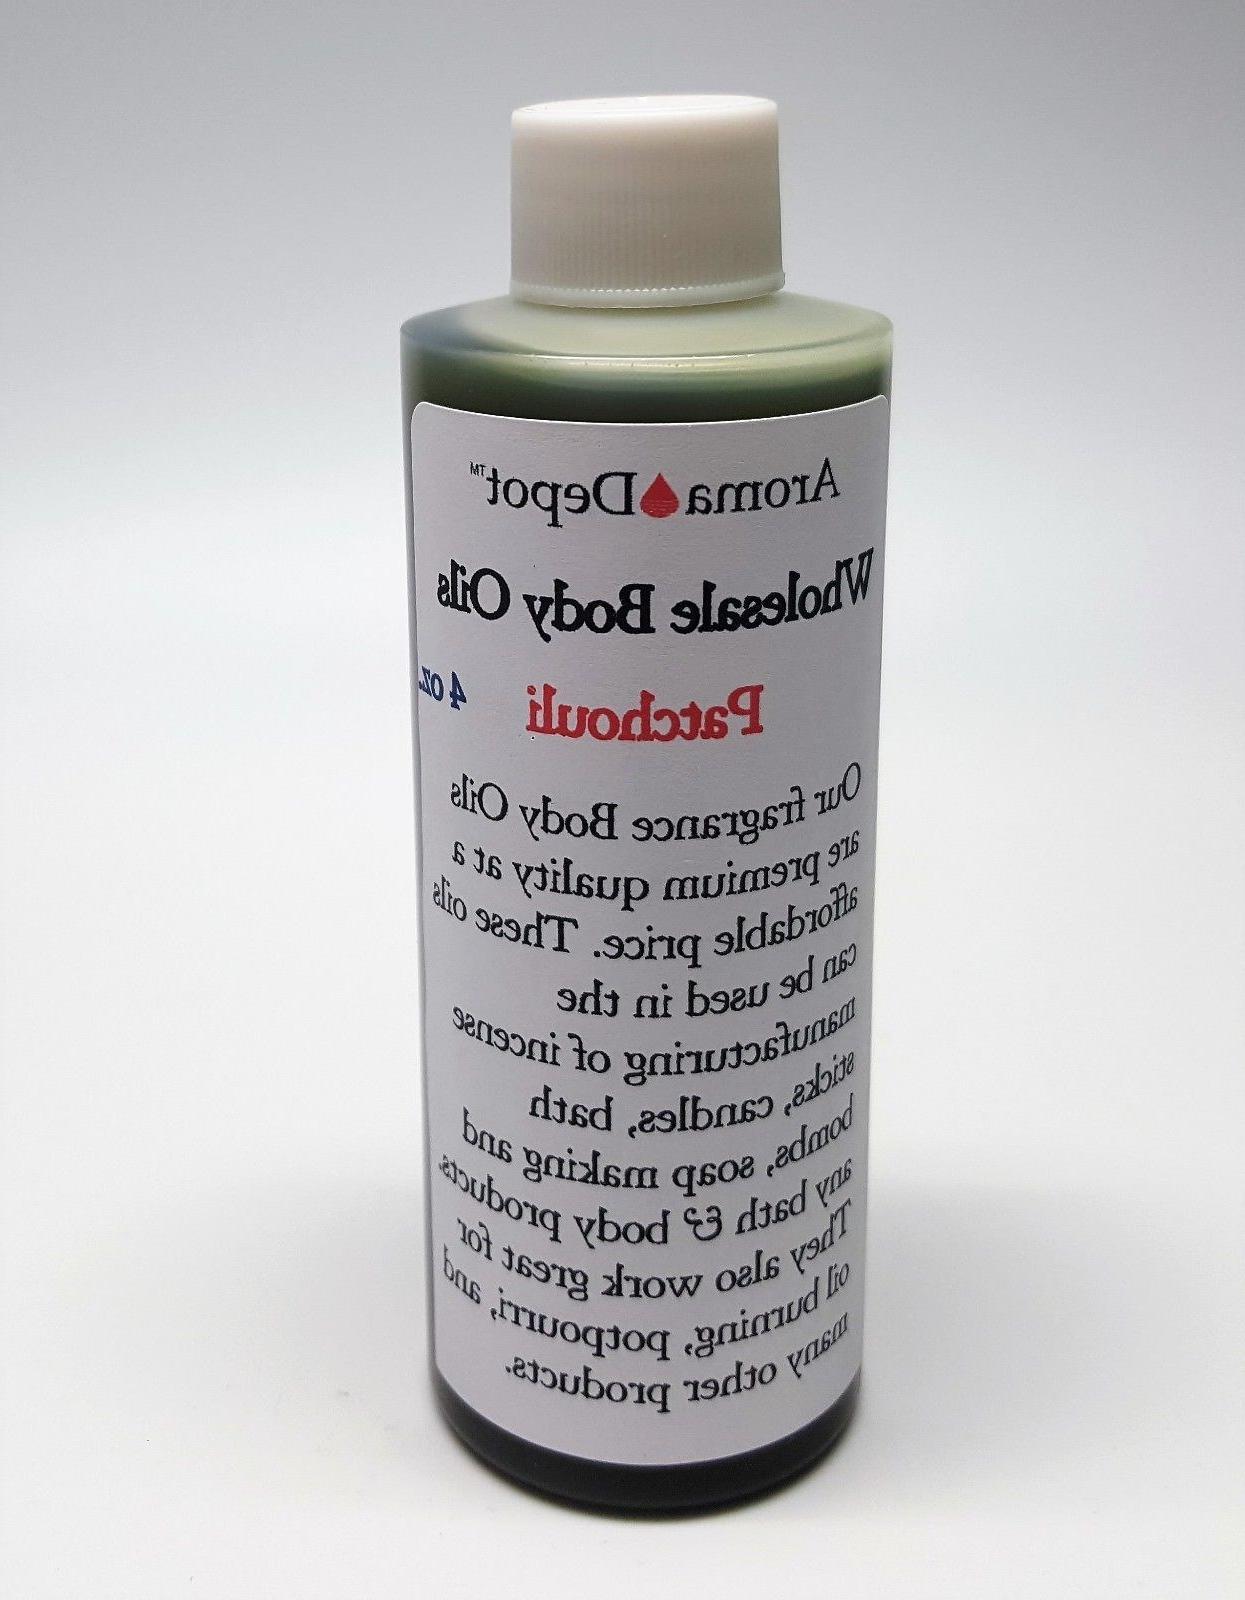 4 Fragrance Oil Candle Bath Bomb Making Phthalate